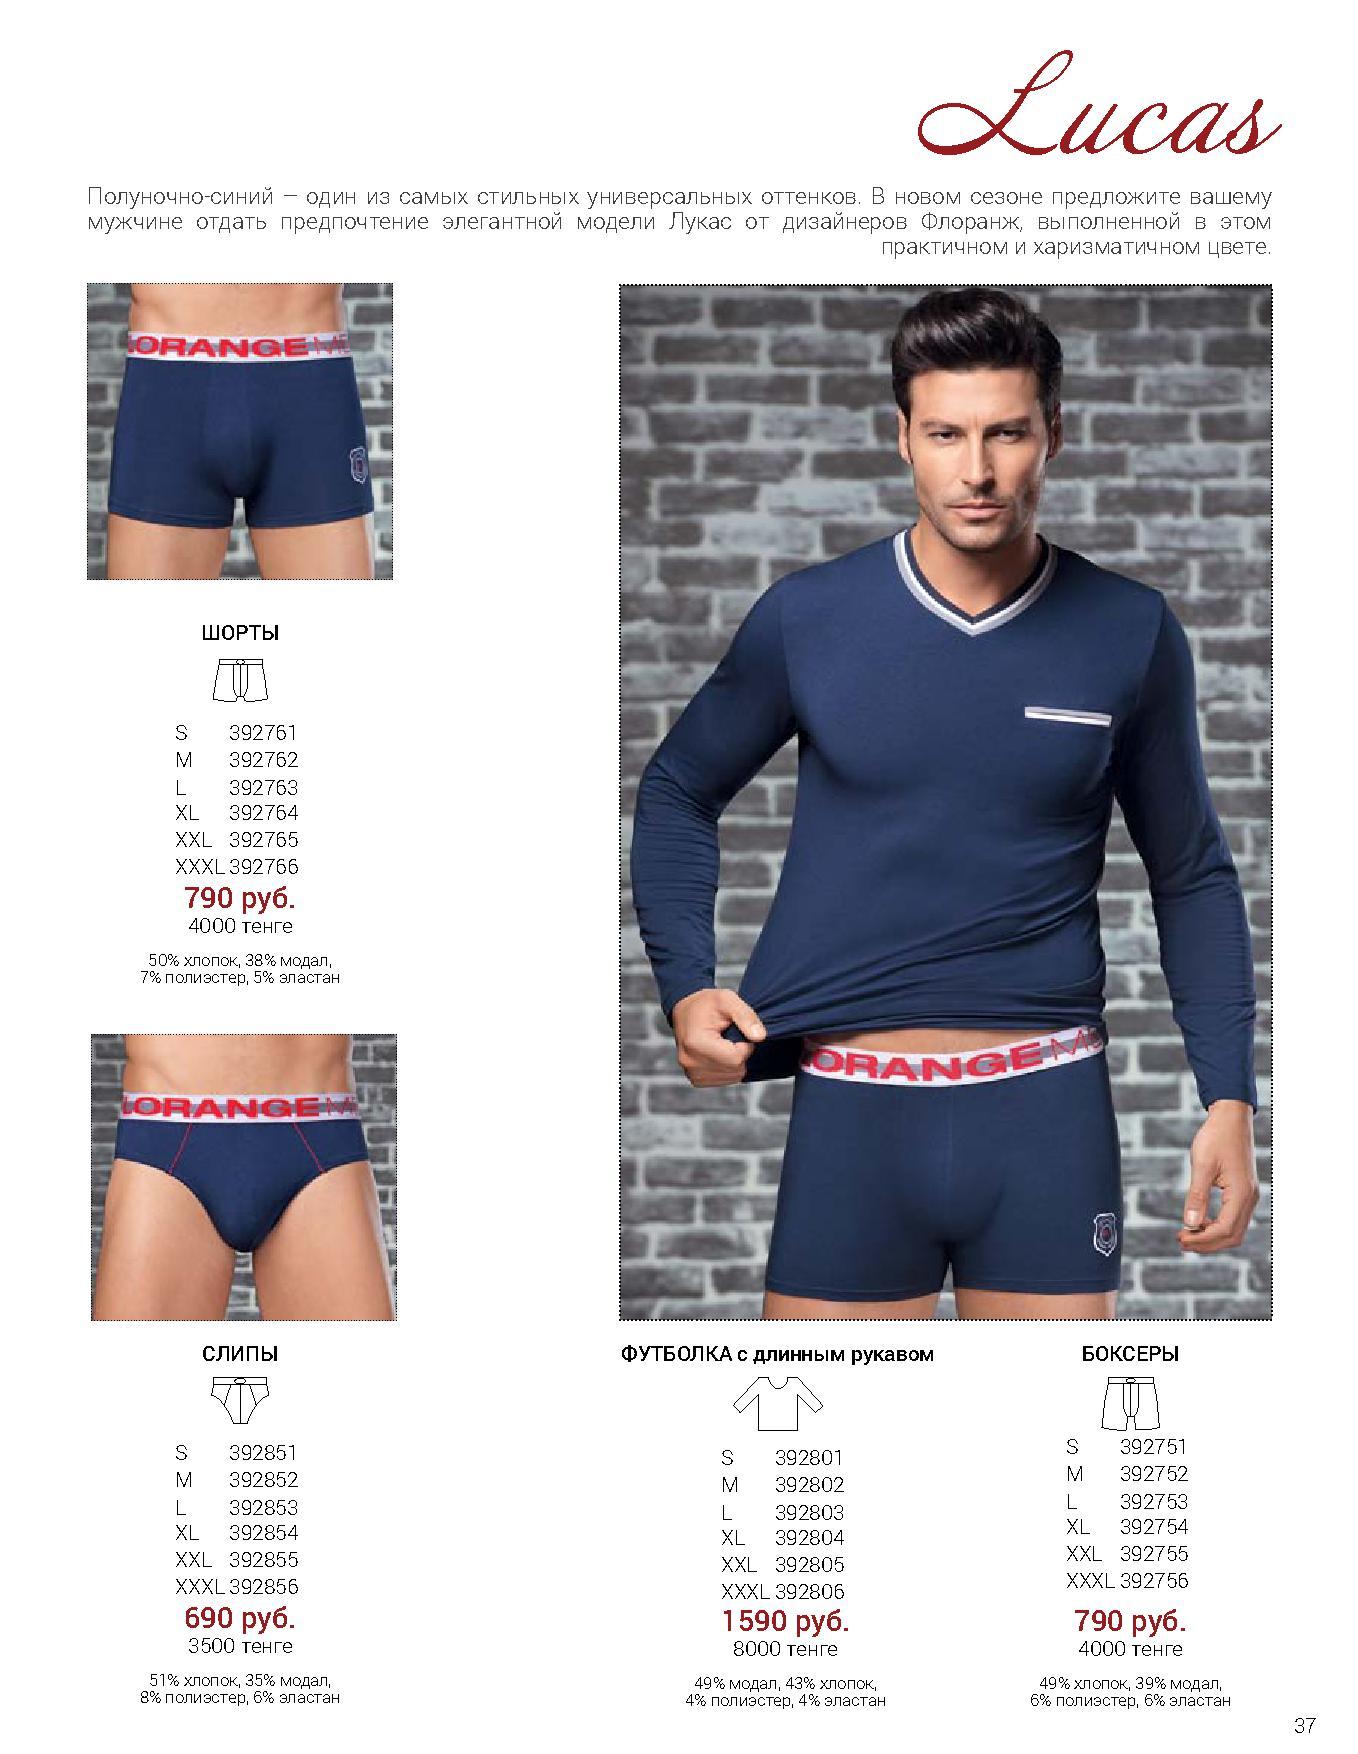 Флоранж - мужской комплект Лукас - шорты, боксеры, слипы и футболка